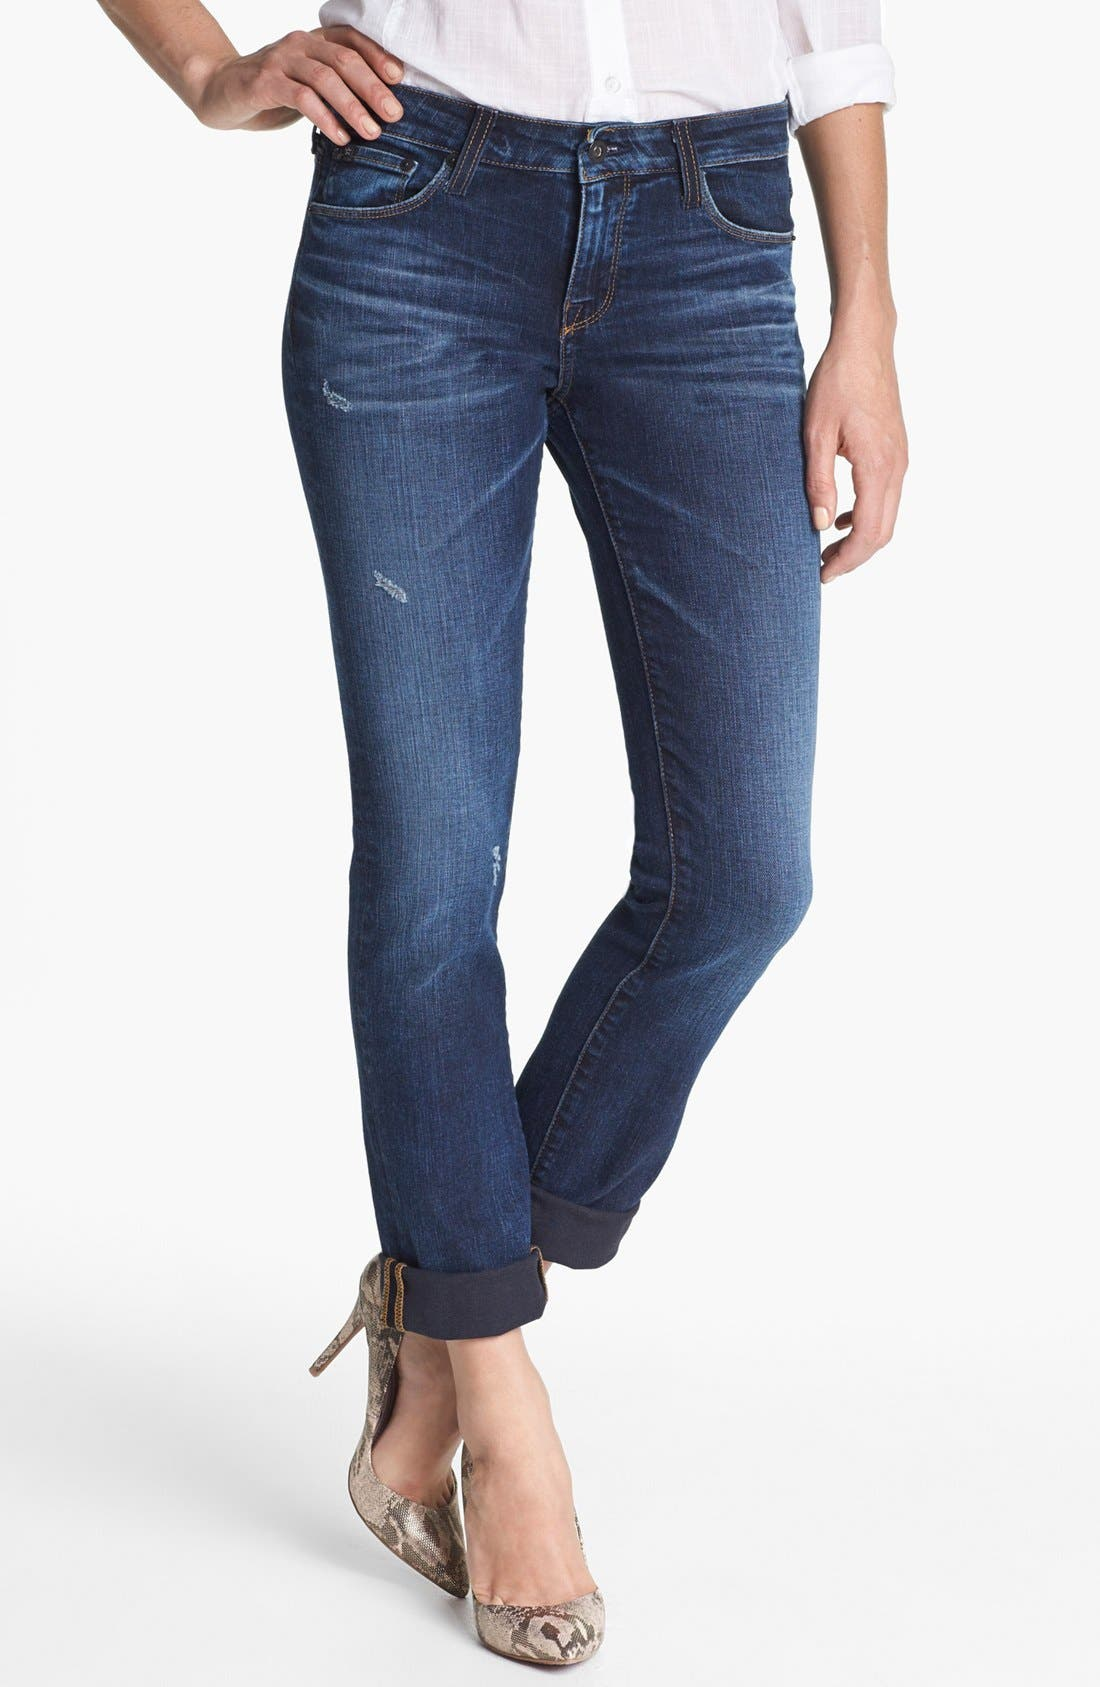 Alternate Image 1 Selected - Big Star 'Kate' Distressed Straight Leg Jeans (Three Year Malibu) (Petite)